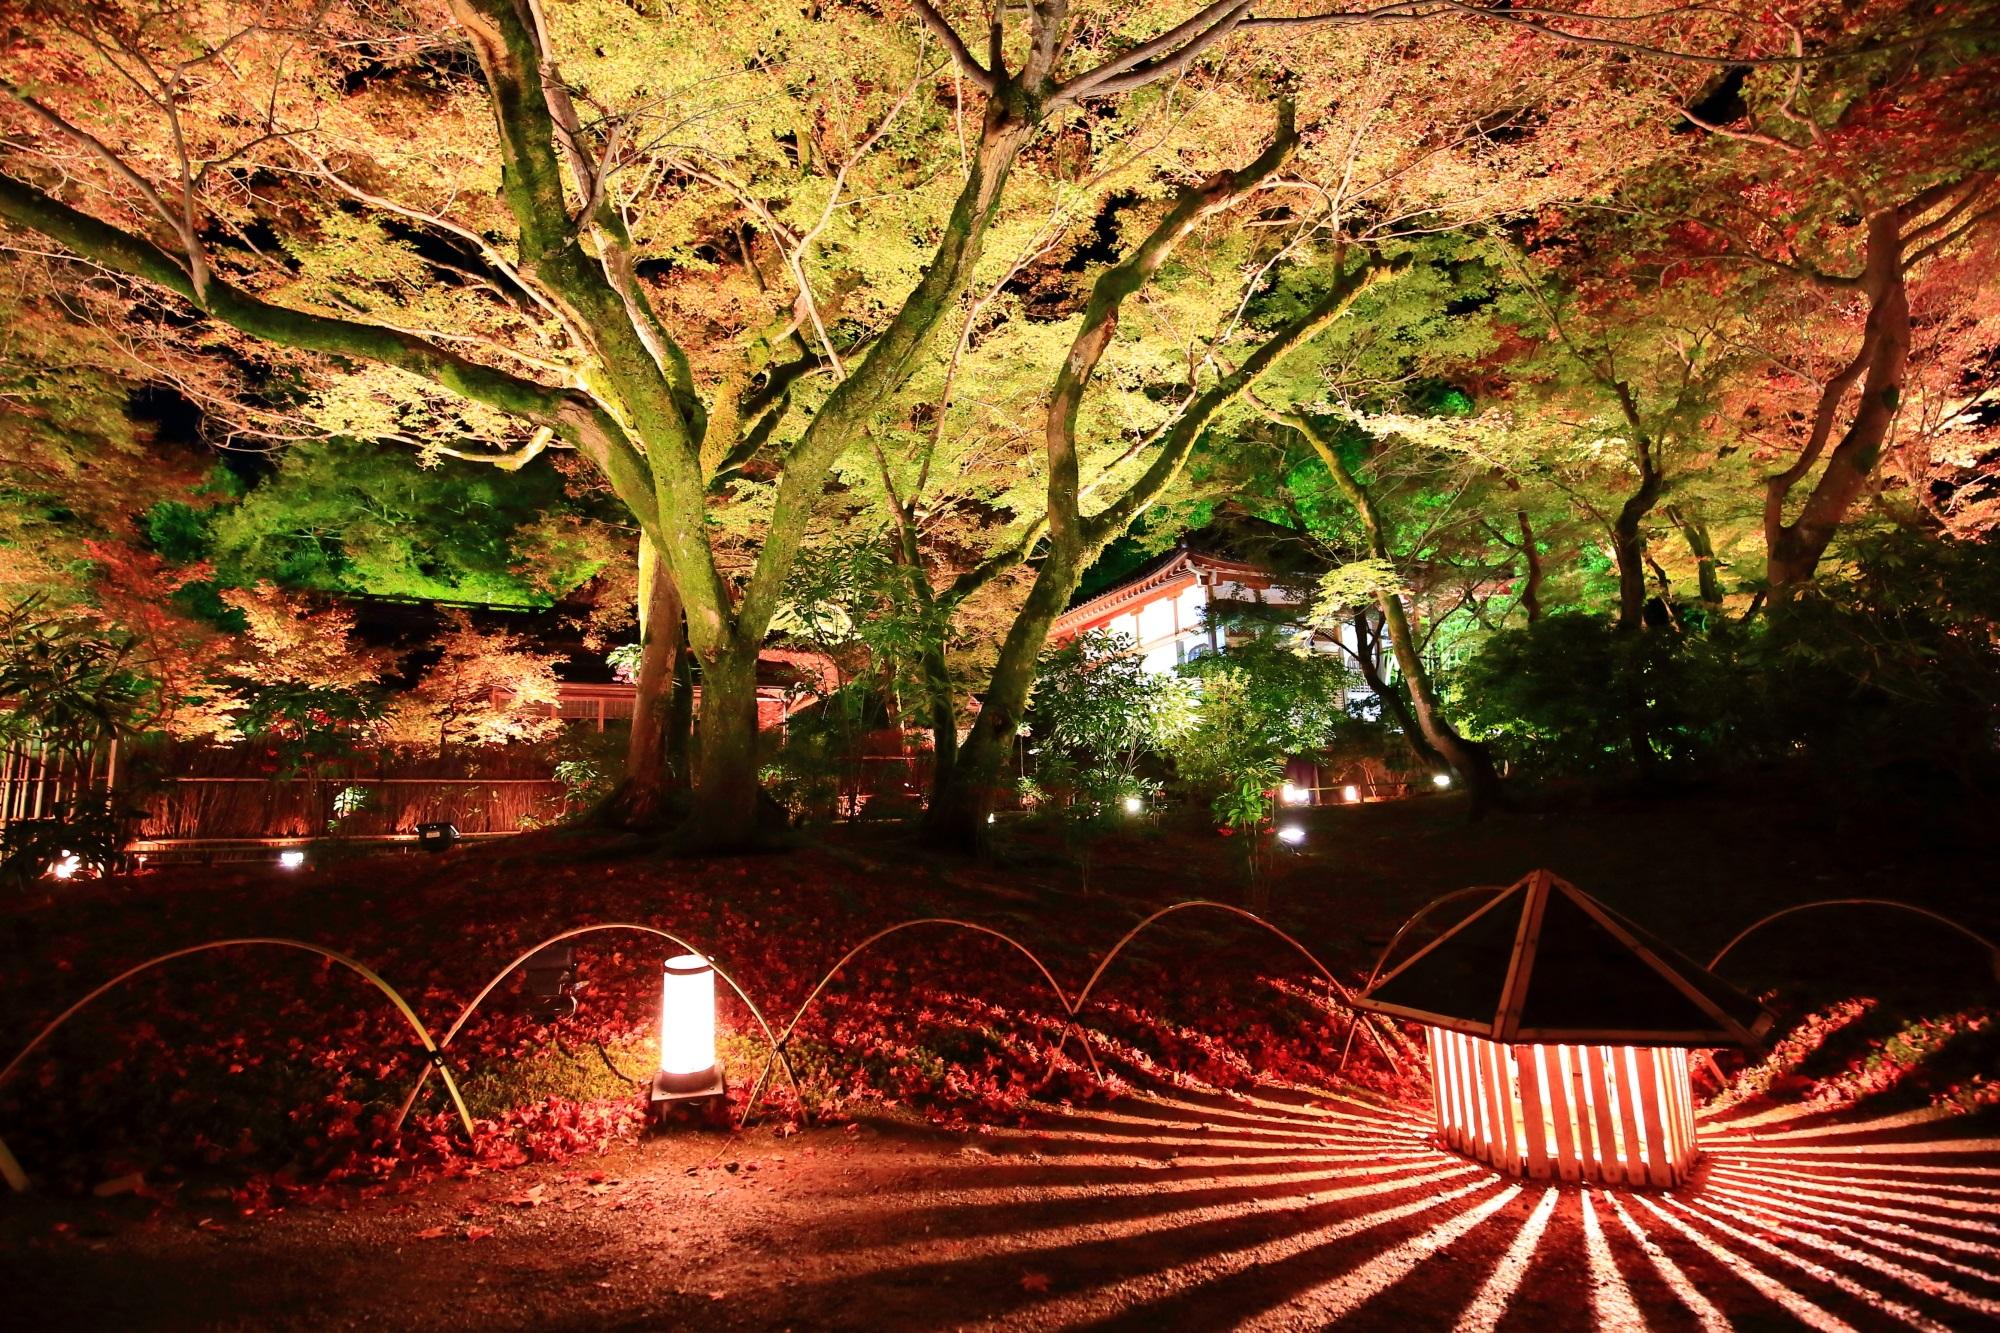 Hogon-in temple Kyoto Arashiyama Tenryu-ji 紅葉 ライトアップ